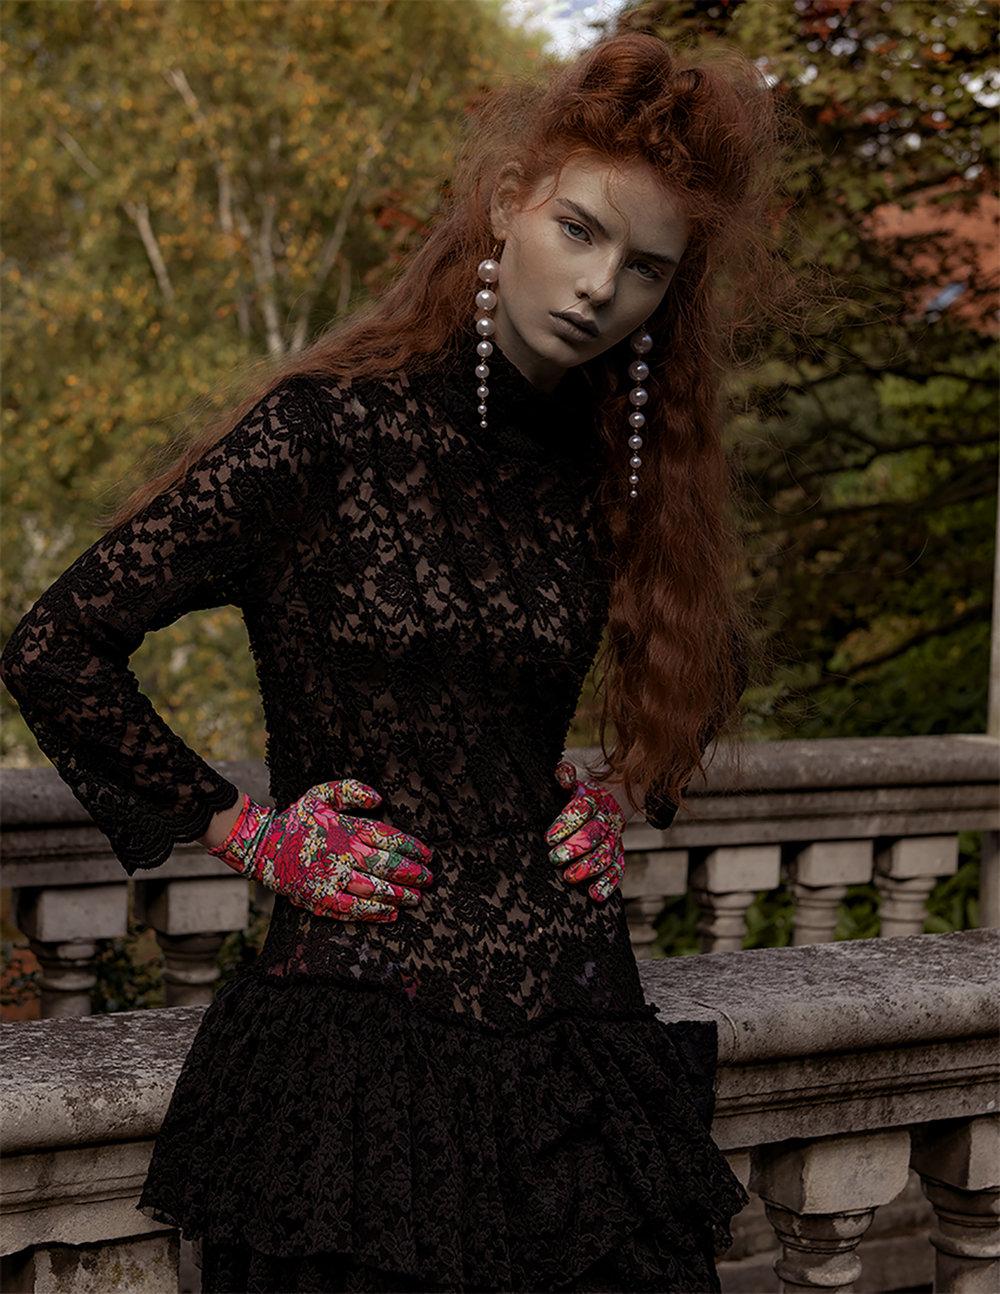 Aretes  House of LoLo , vestido  Aleksandra Seweryniak ,  guantes  PRTTYBOI LDN , botas  ASOS